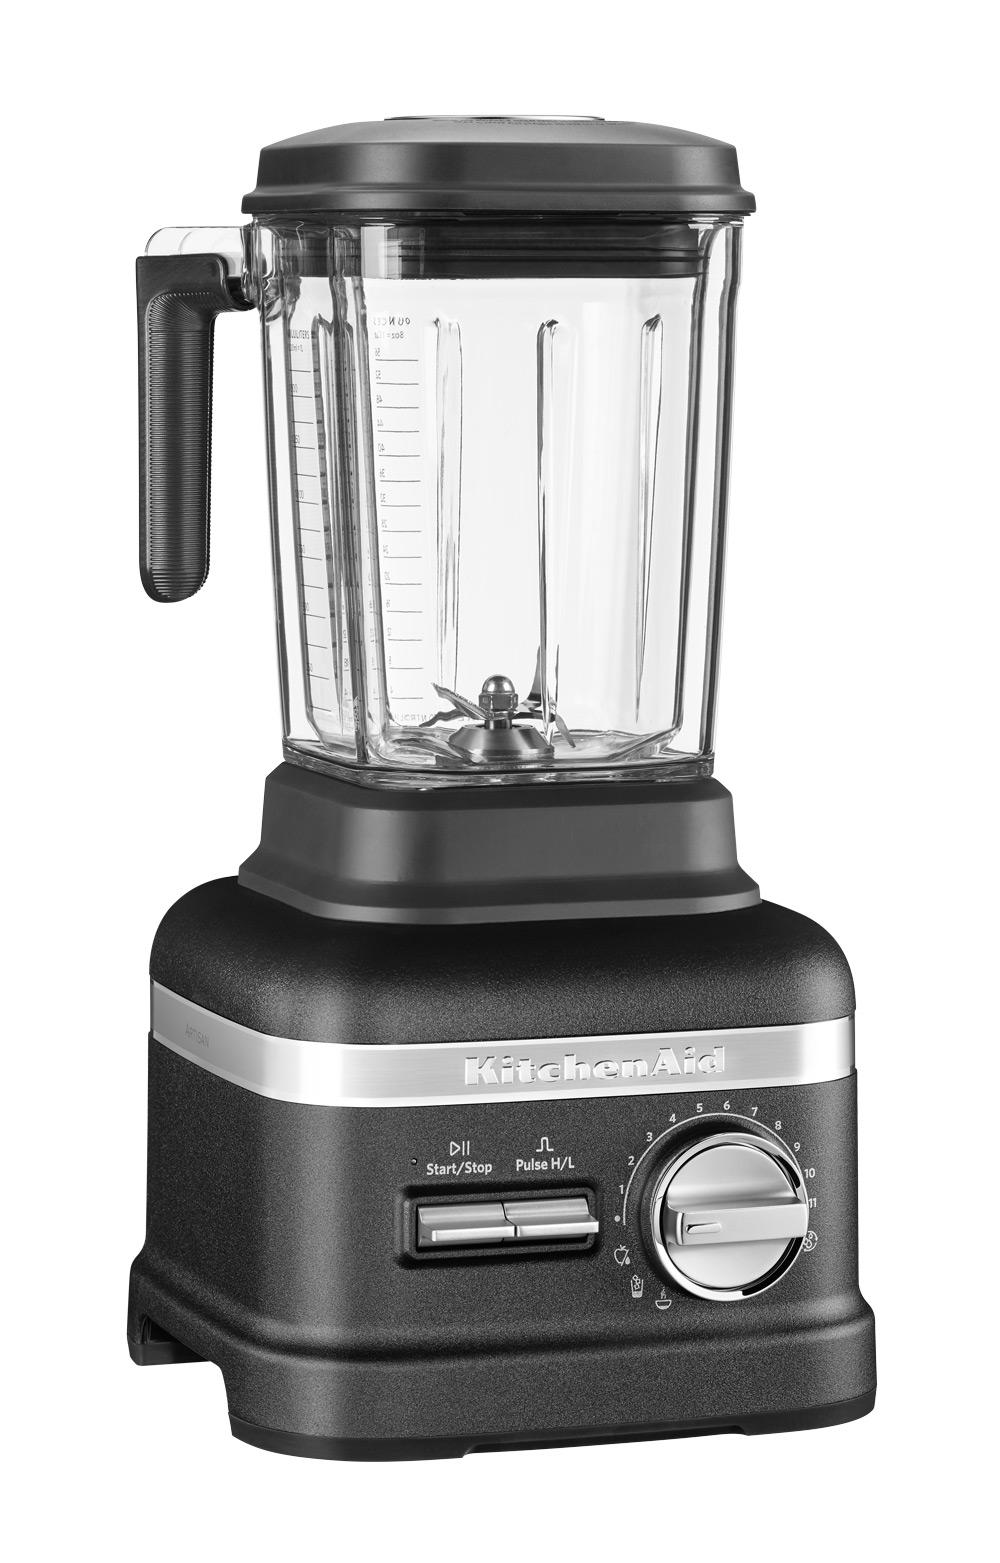 KitchenAid Power Plus Blender Svart